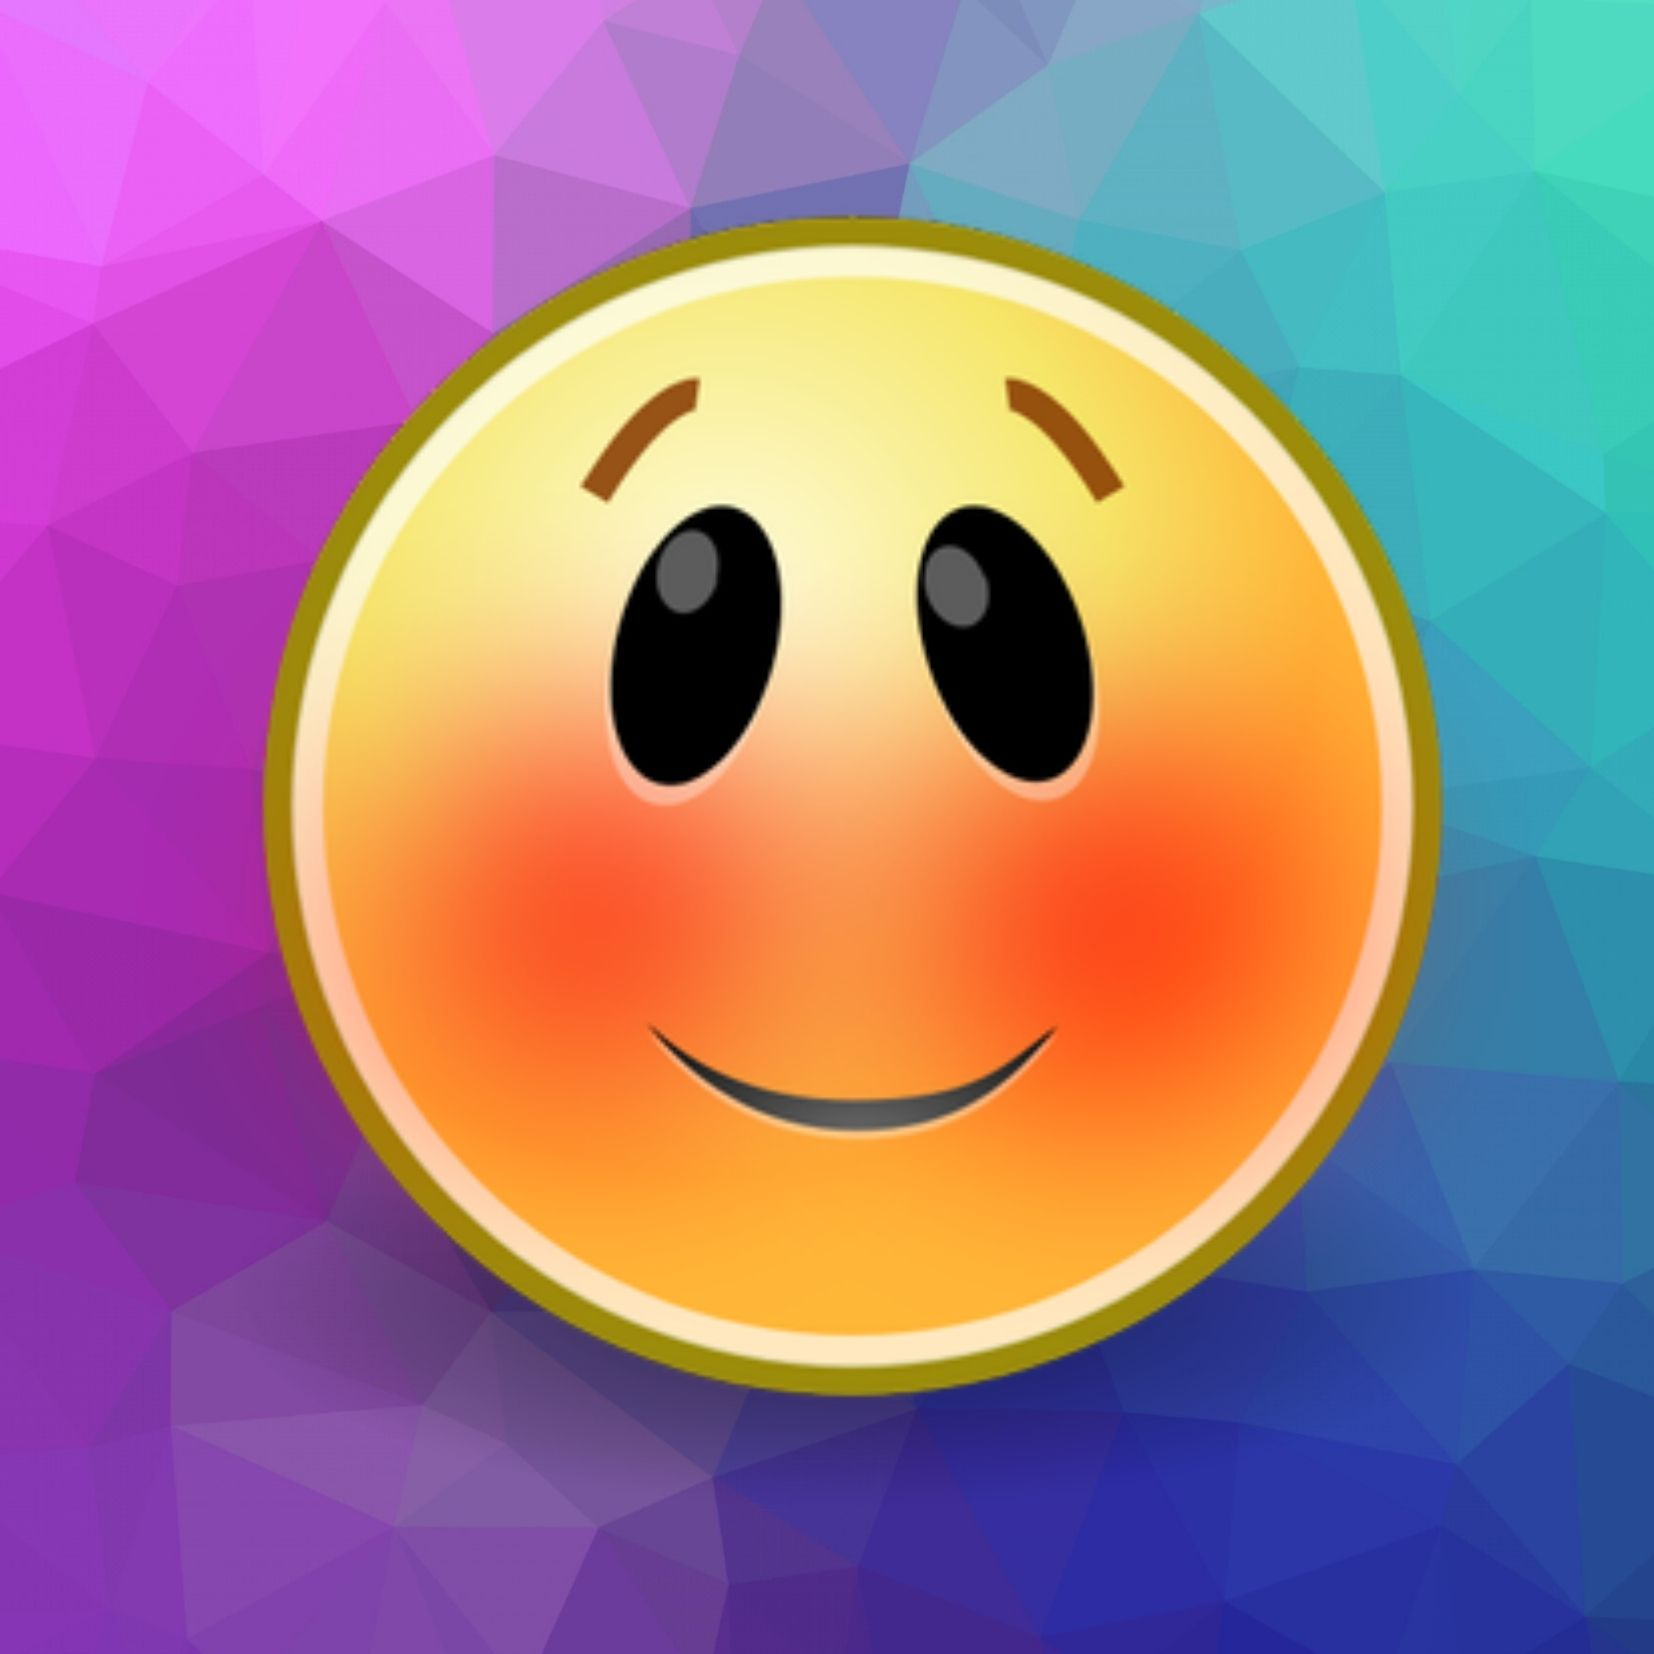 embarassed emoji